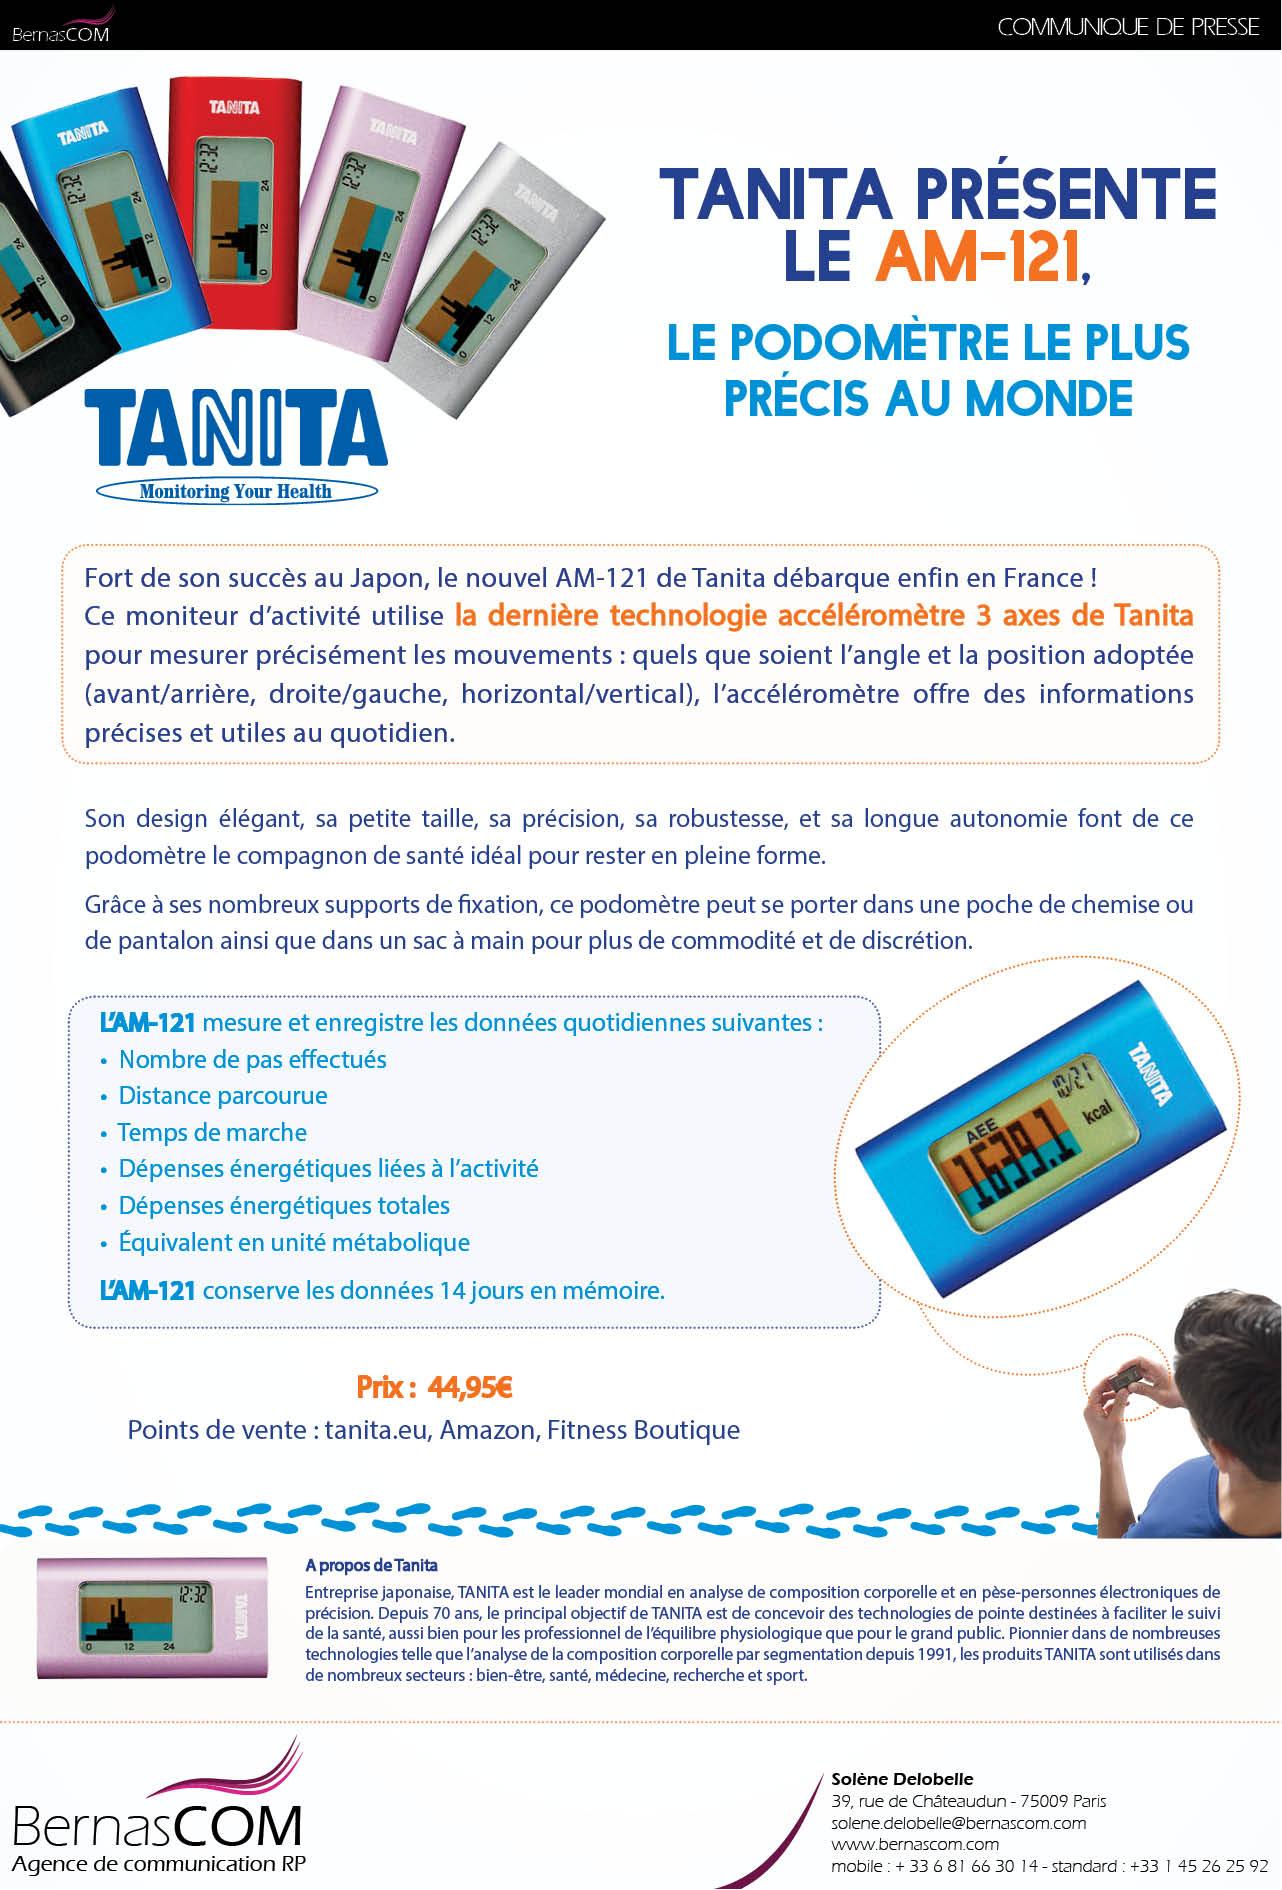 TANITA_CP-Podometre-AM121